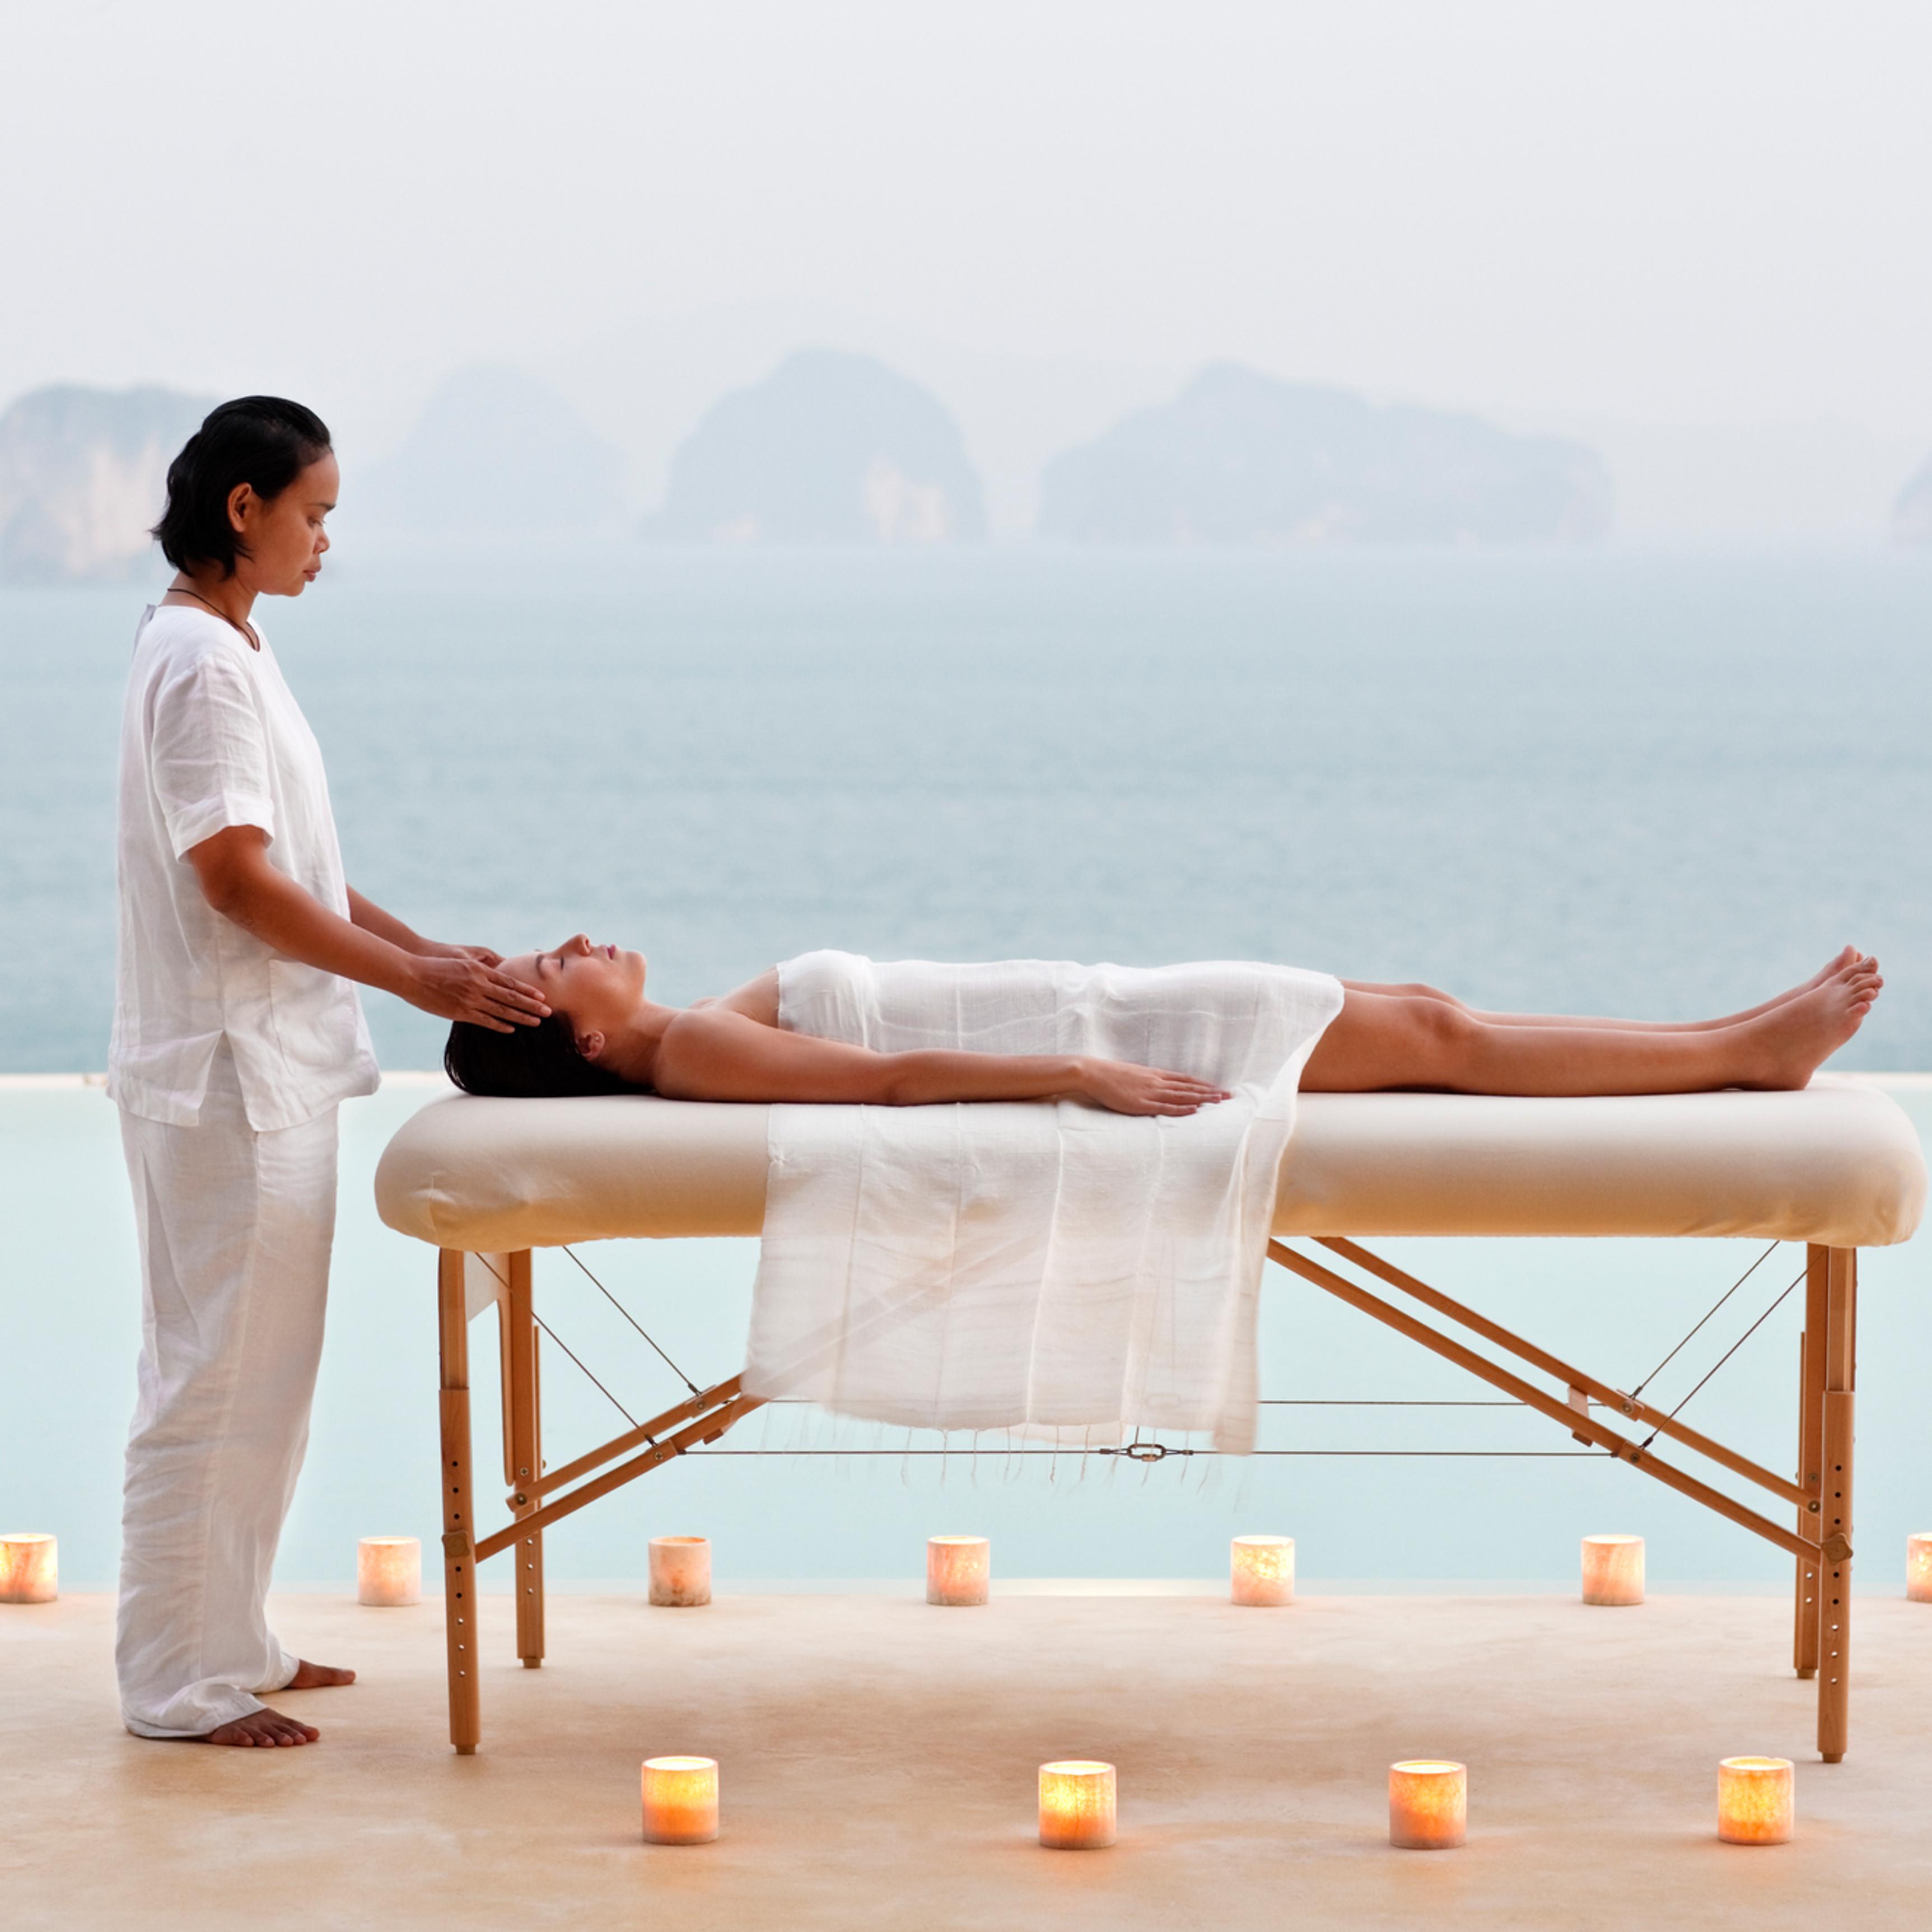 Student Spirit Soul -Relaxation Massage